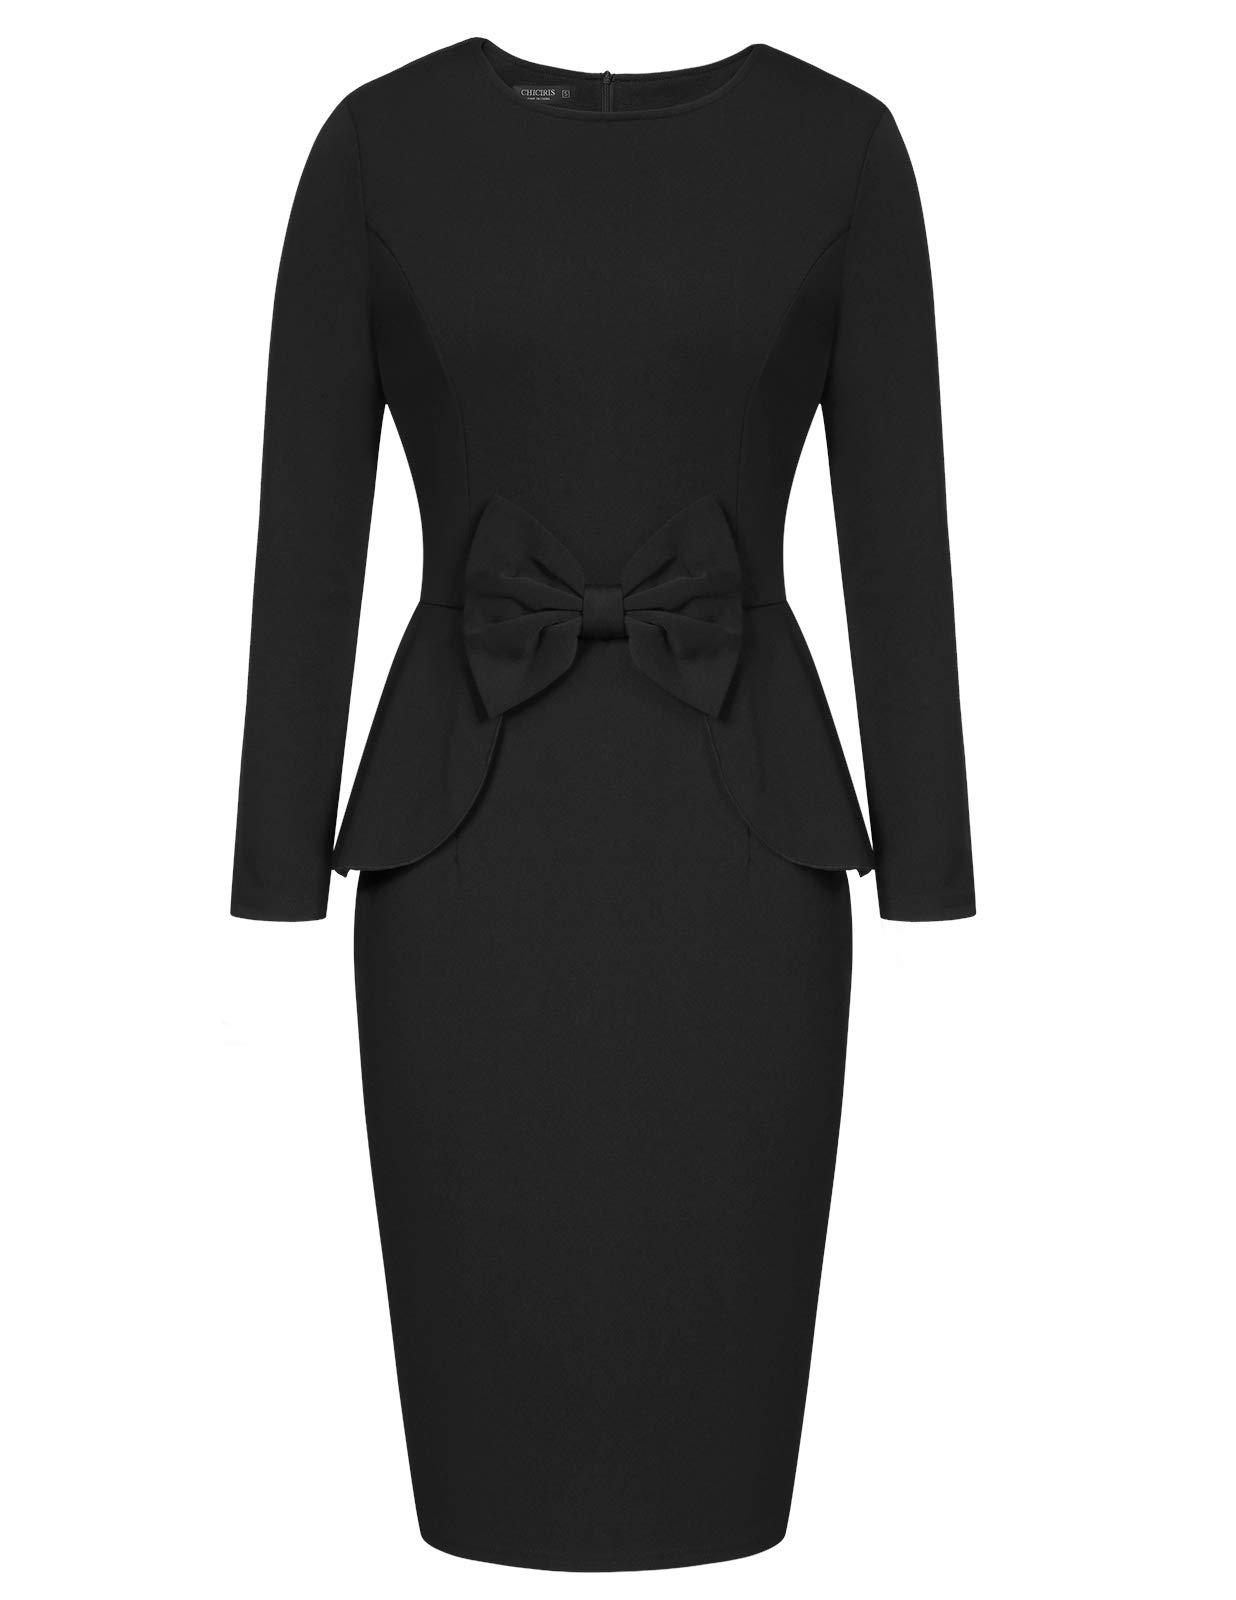 CHICIRIS Women's Vintage Long Sleeve Crossover V Neck Ruffle Waist Tank Bodycon Pencil Dress